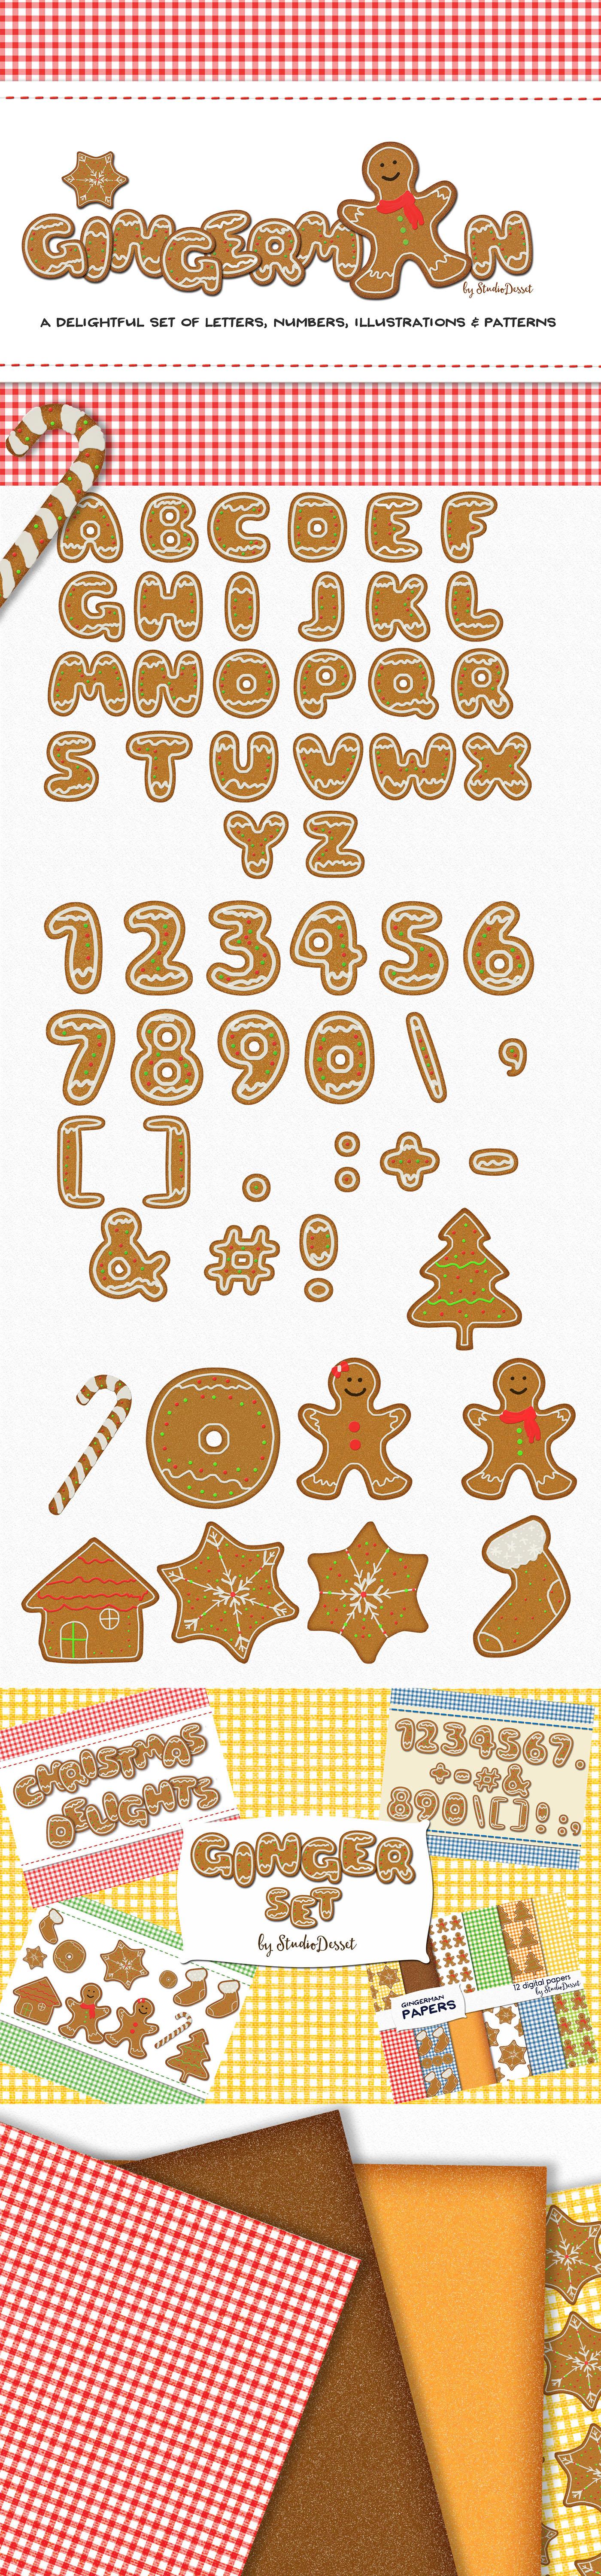 Gingerman Design Bundle - Letters, Numbers, Illustrations example image 8